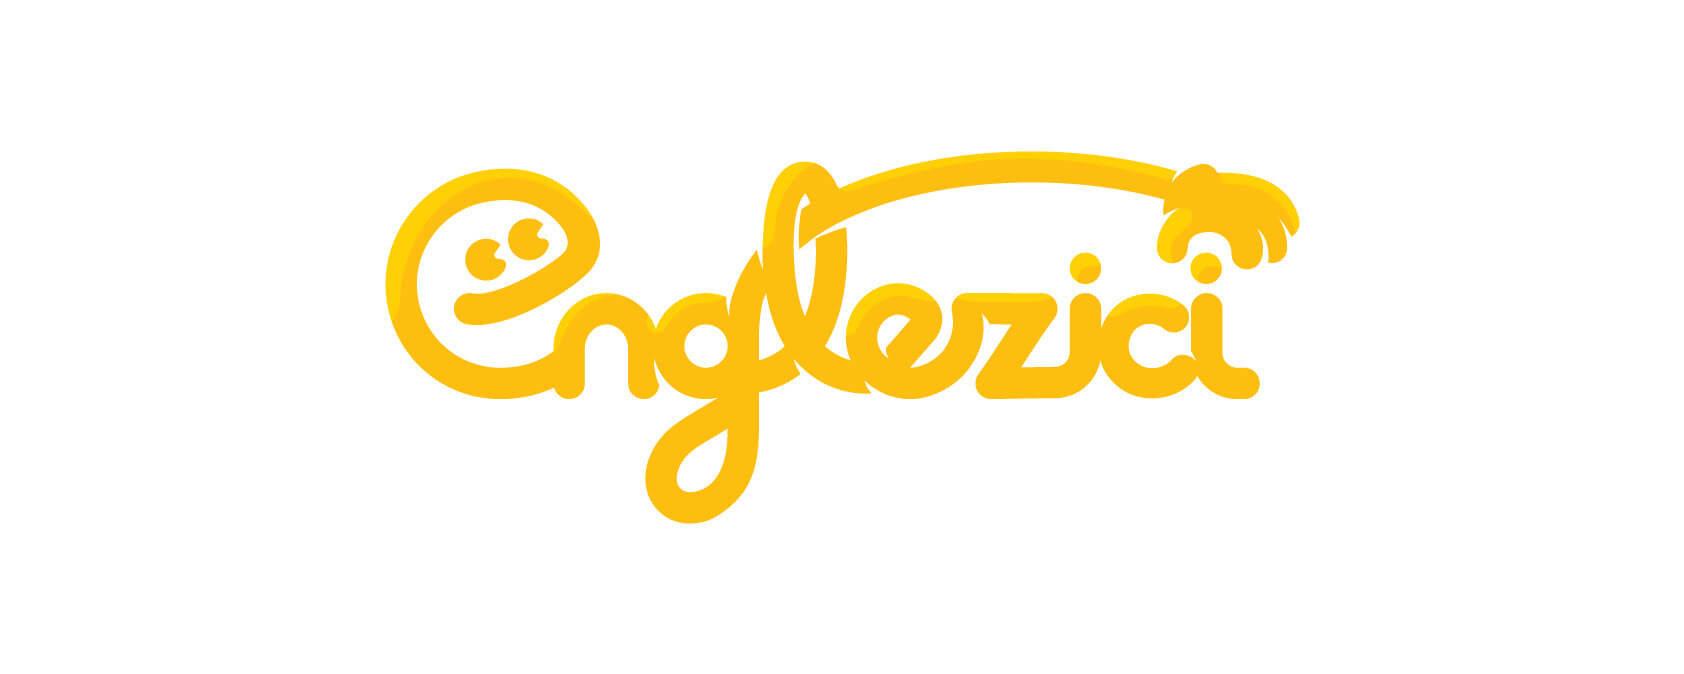 englezici-master-logo